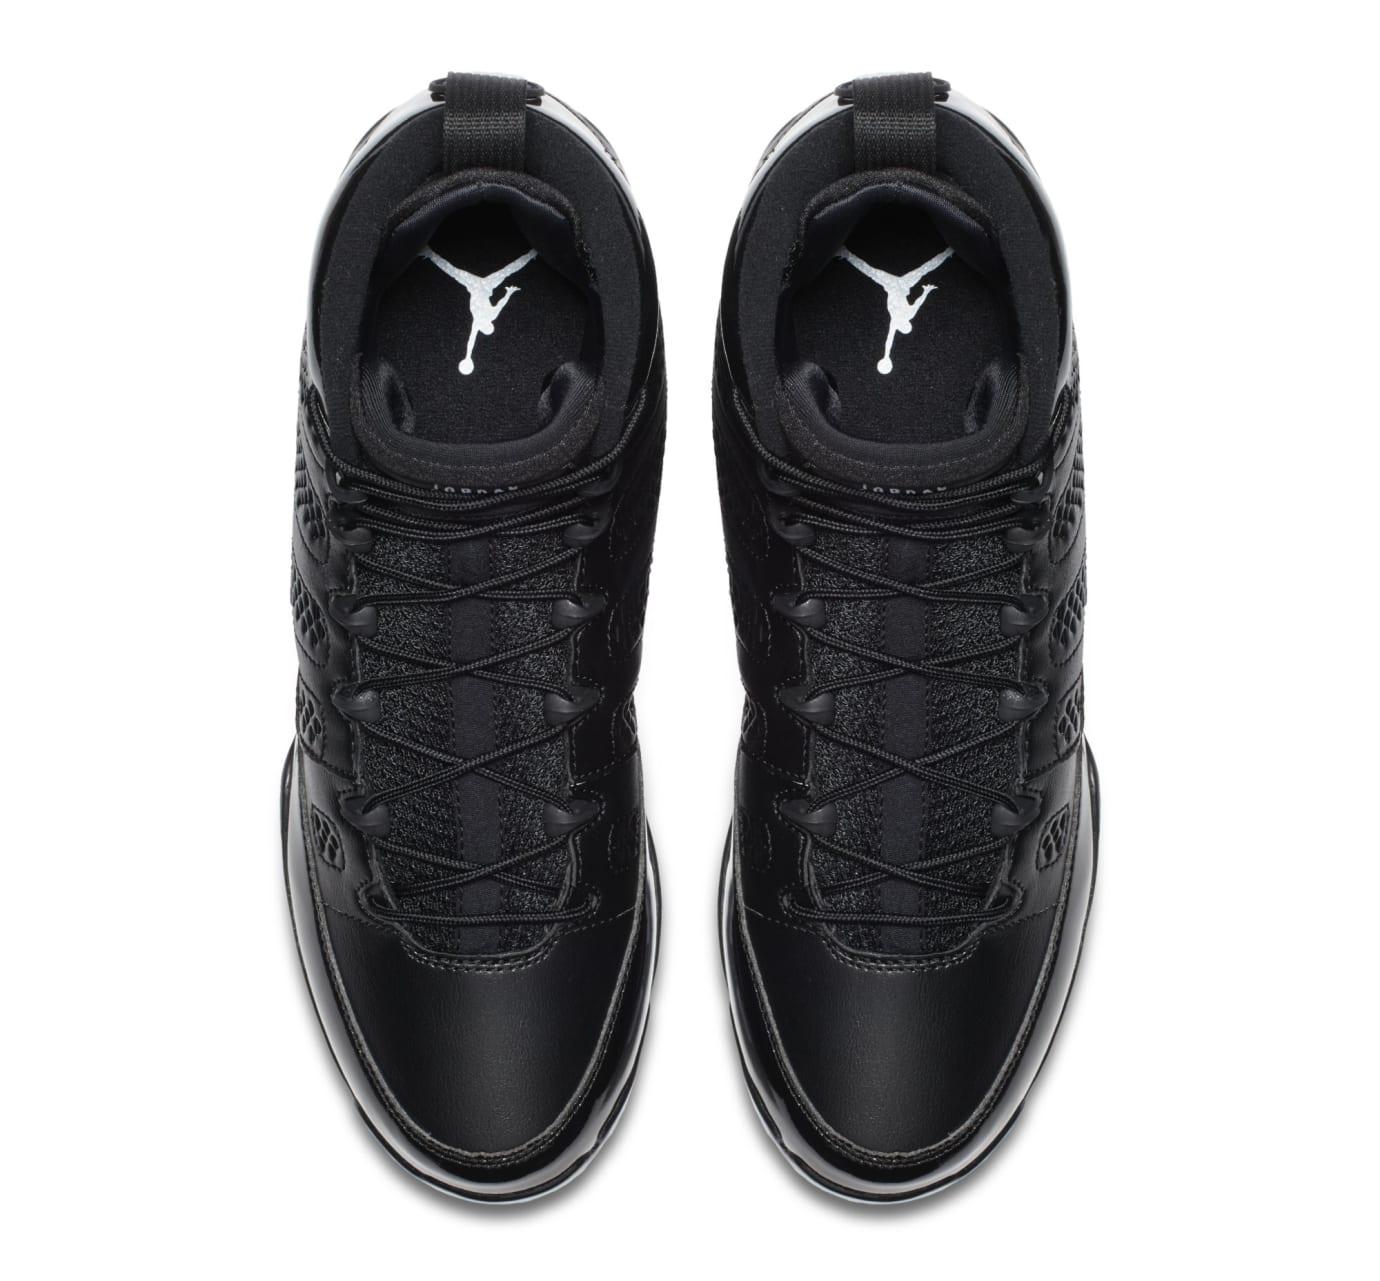 Air Jordan 9 IX MCS Baseball Cleats Black Top